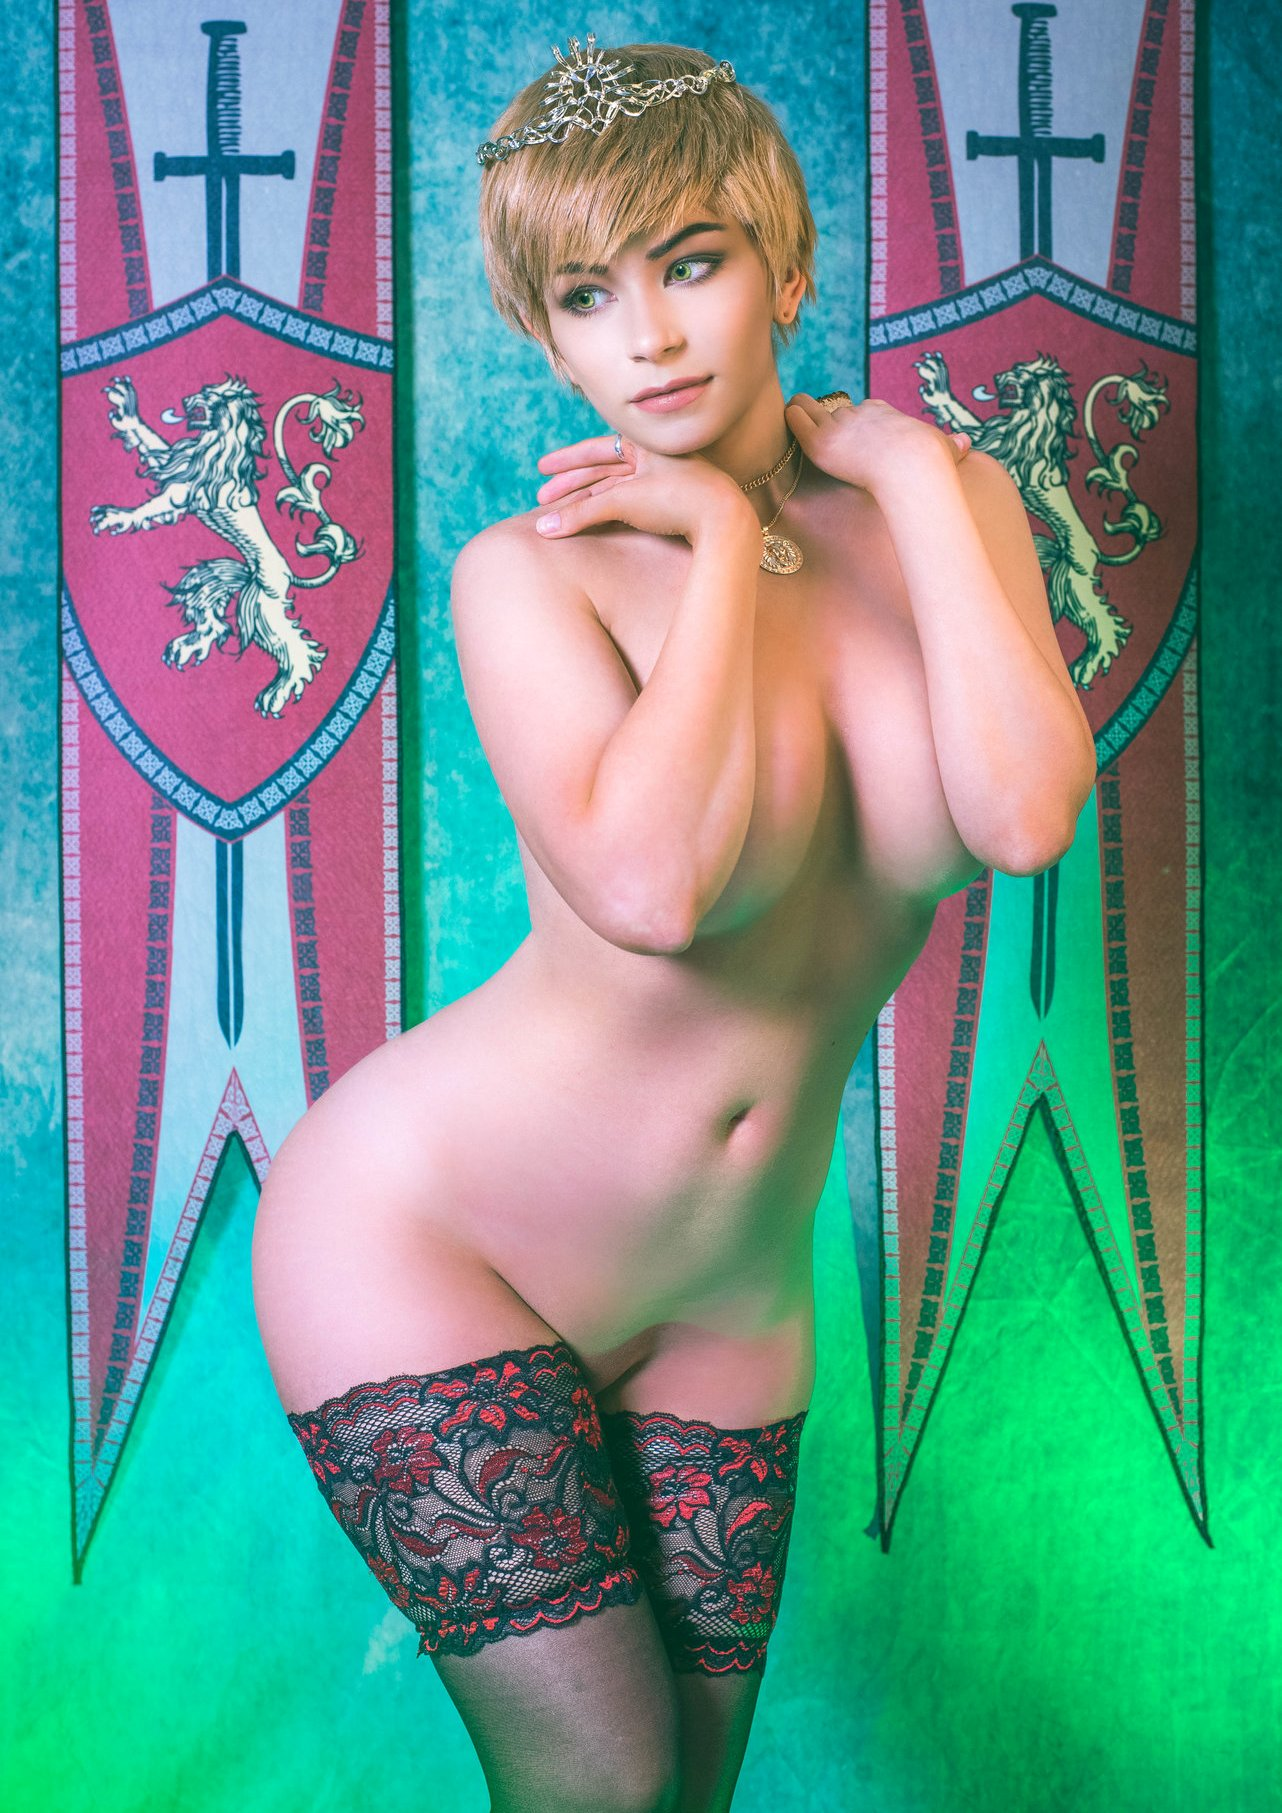 Danielle Beaulieu Daniellecosplay Onlyfans Nude Leaks 0042